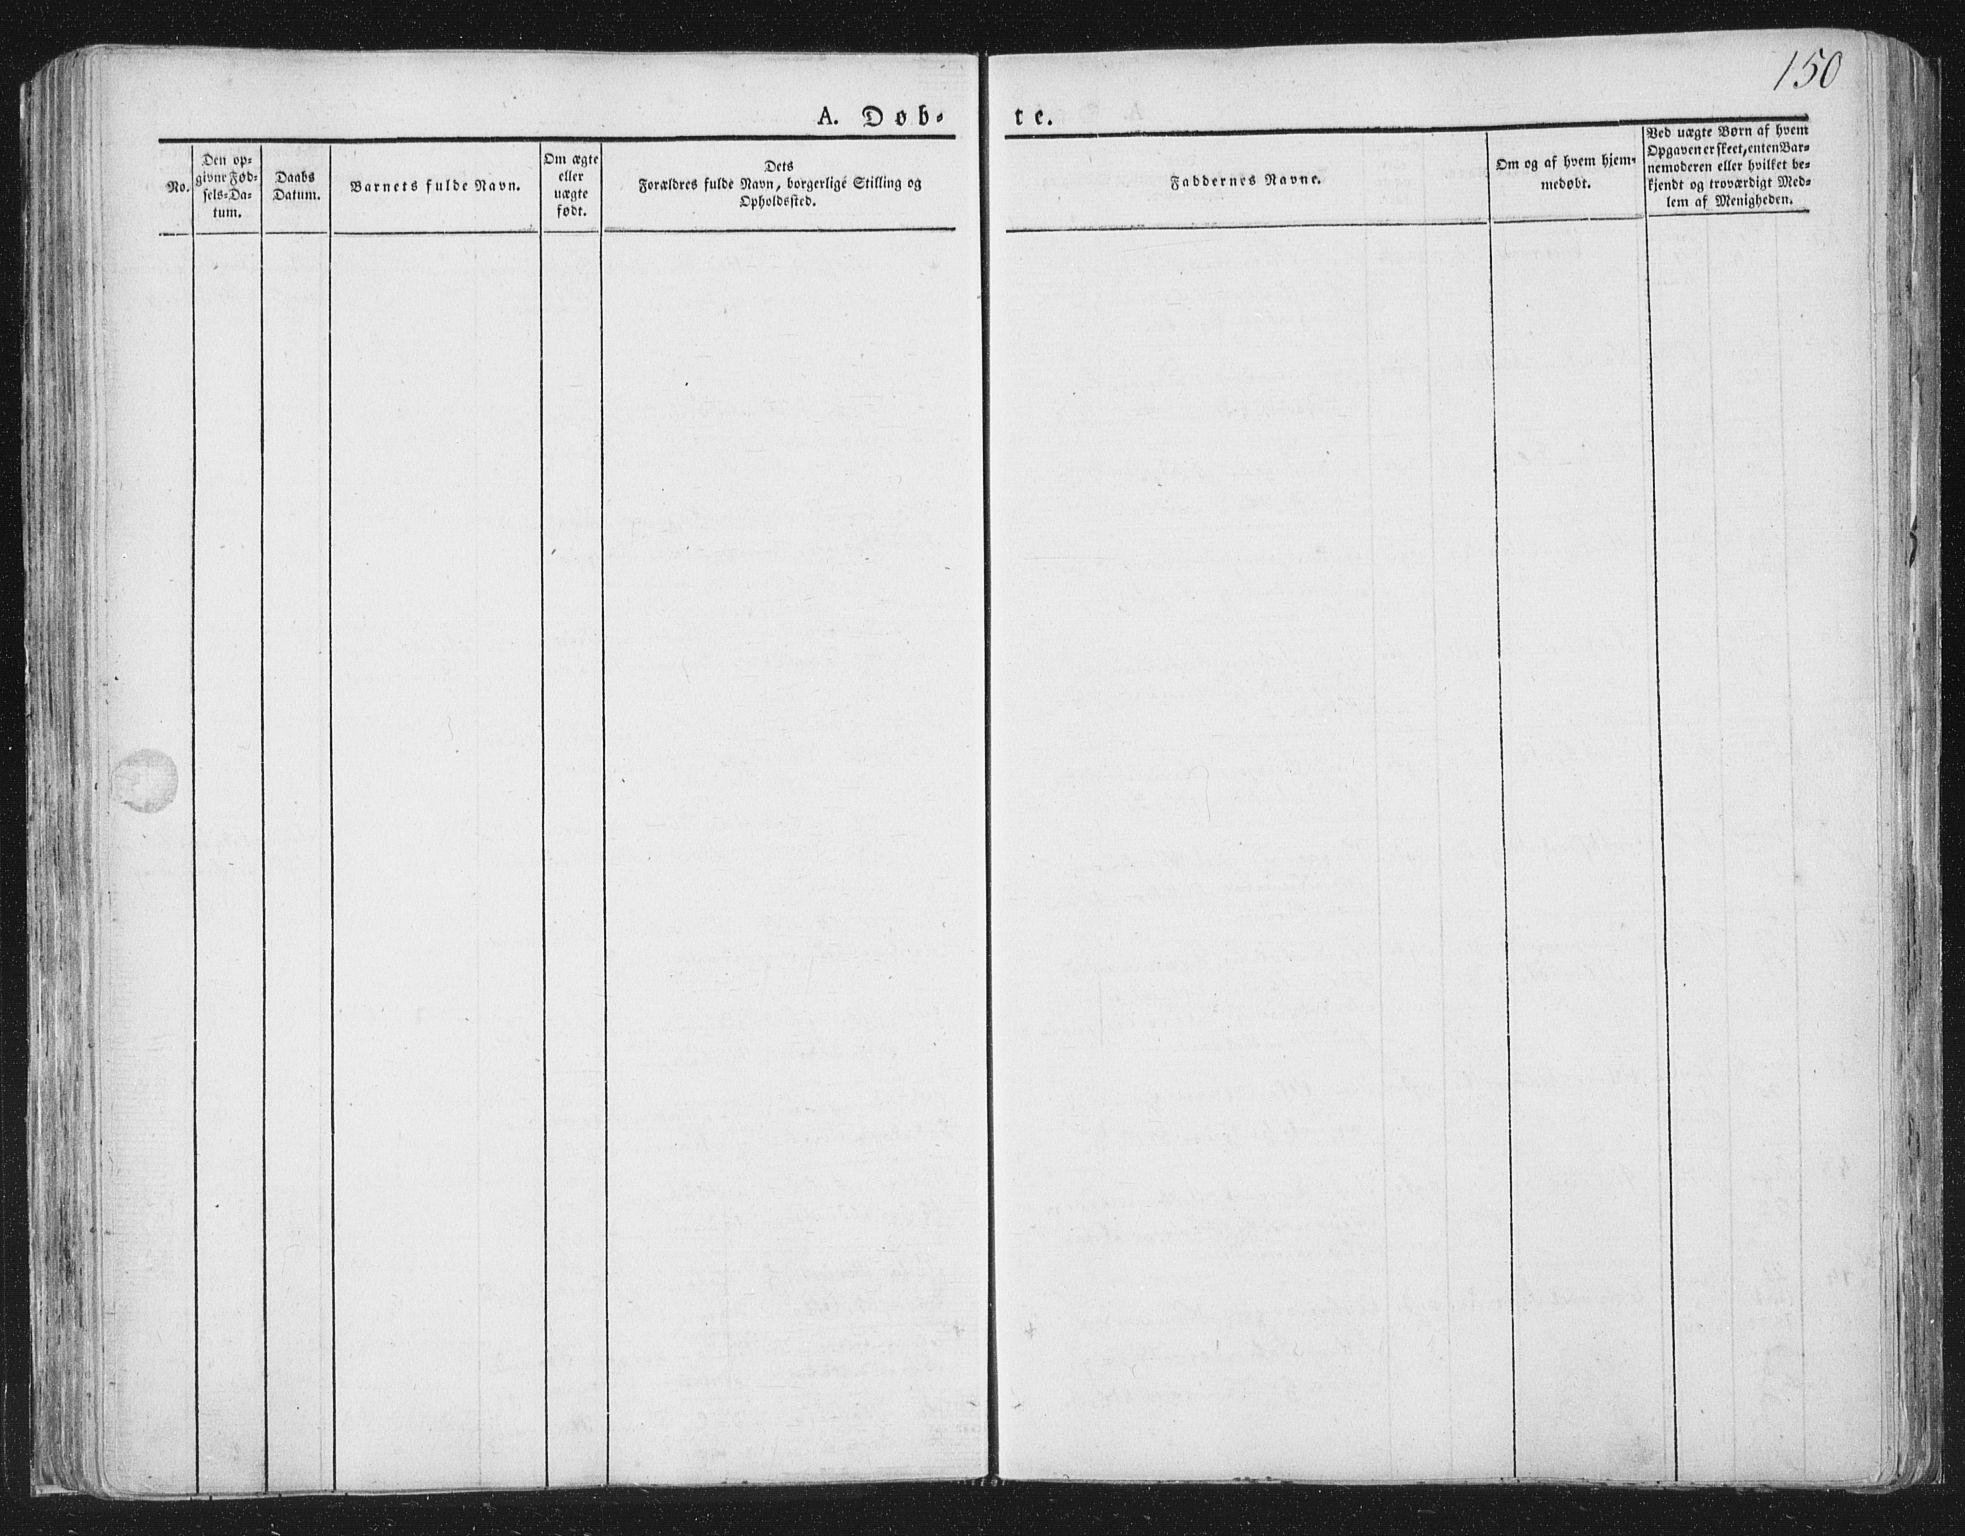 SAT, Ministerialprotokoller, klokkerbøker og fødselsregistre - Nord-Trøndelag, 764/L0551: Ministerialbok nr. 764A07a, 1824-1864, s. 150